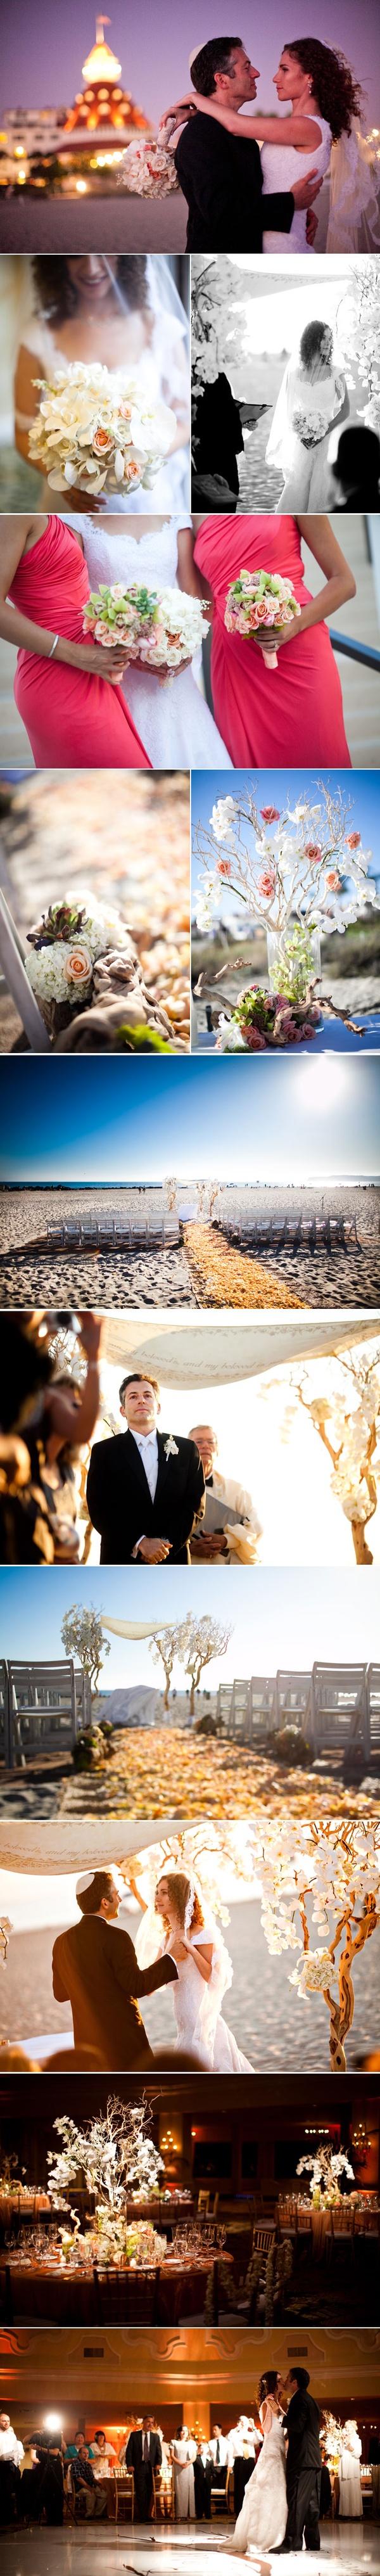 Ceremony at beach